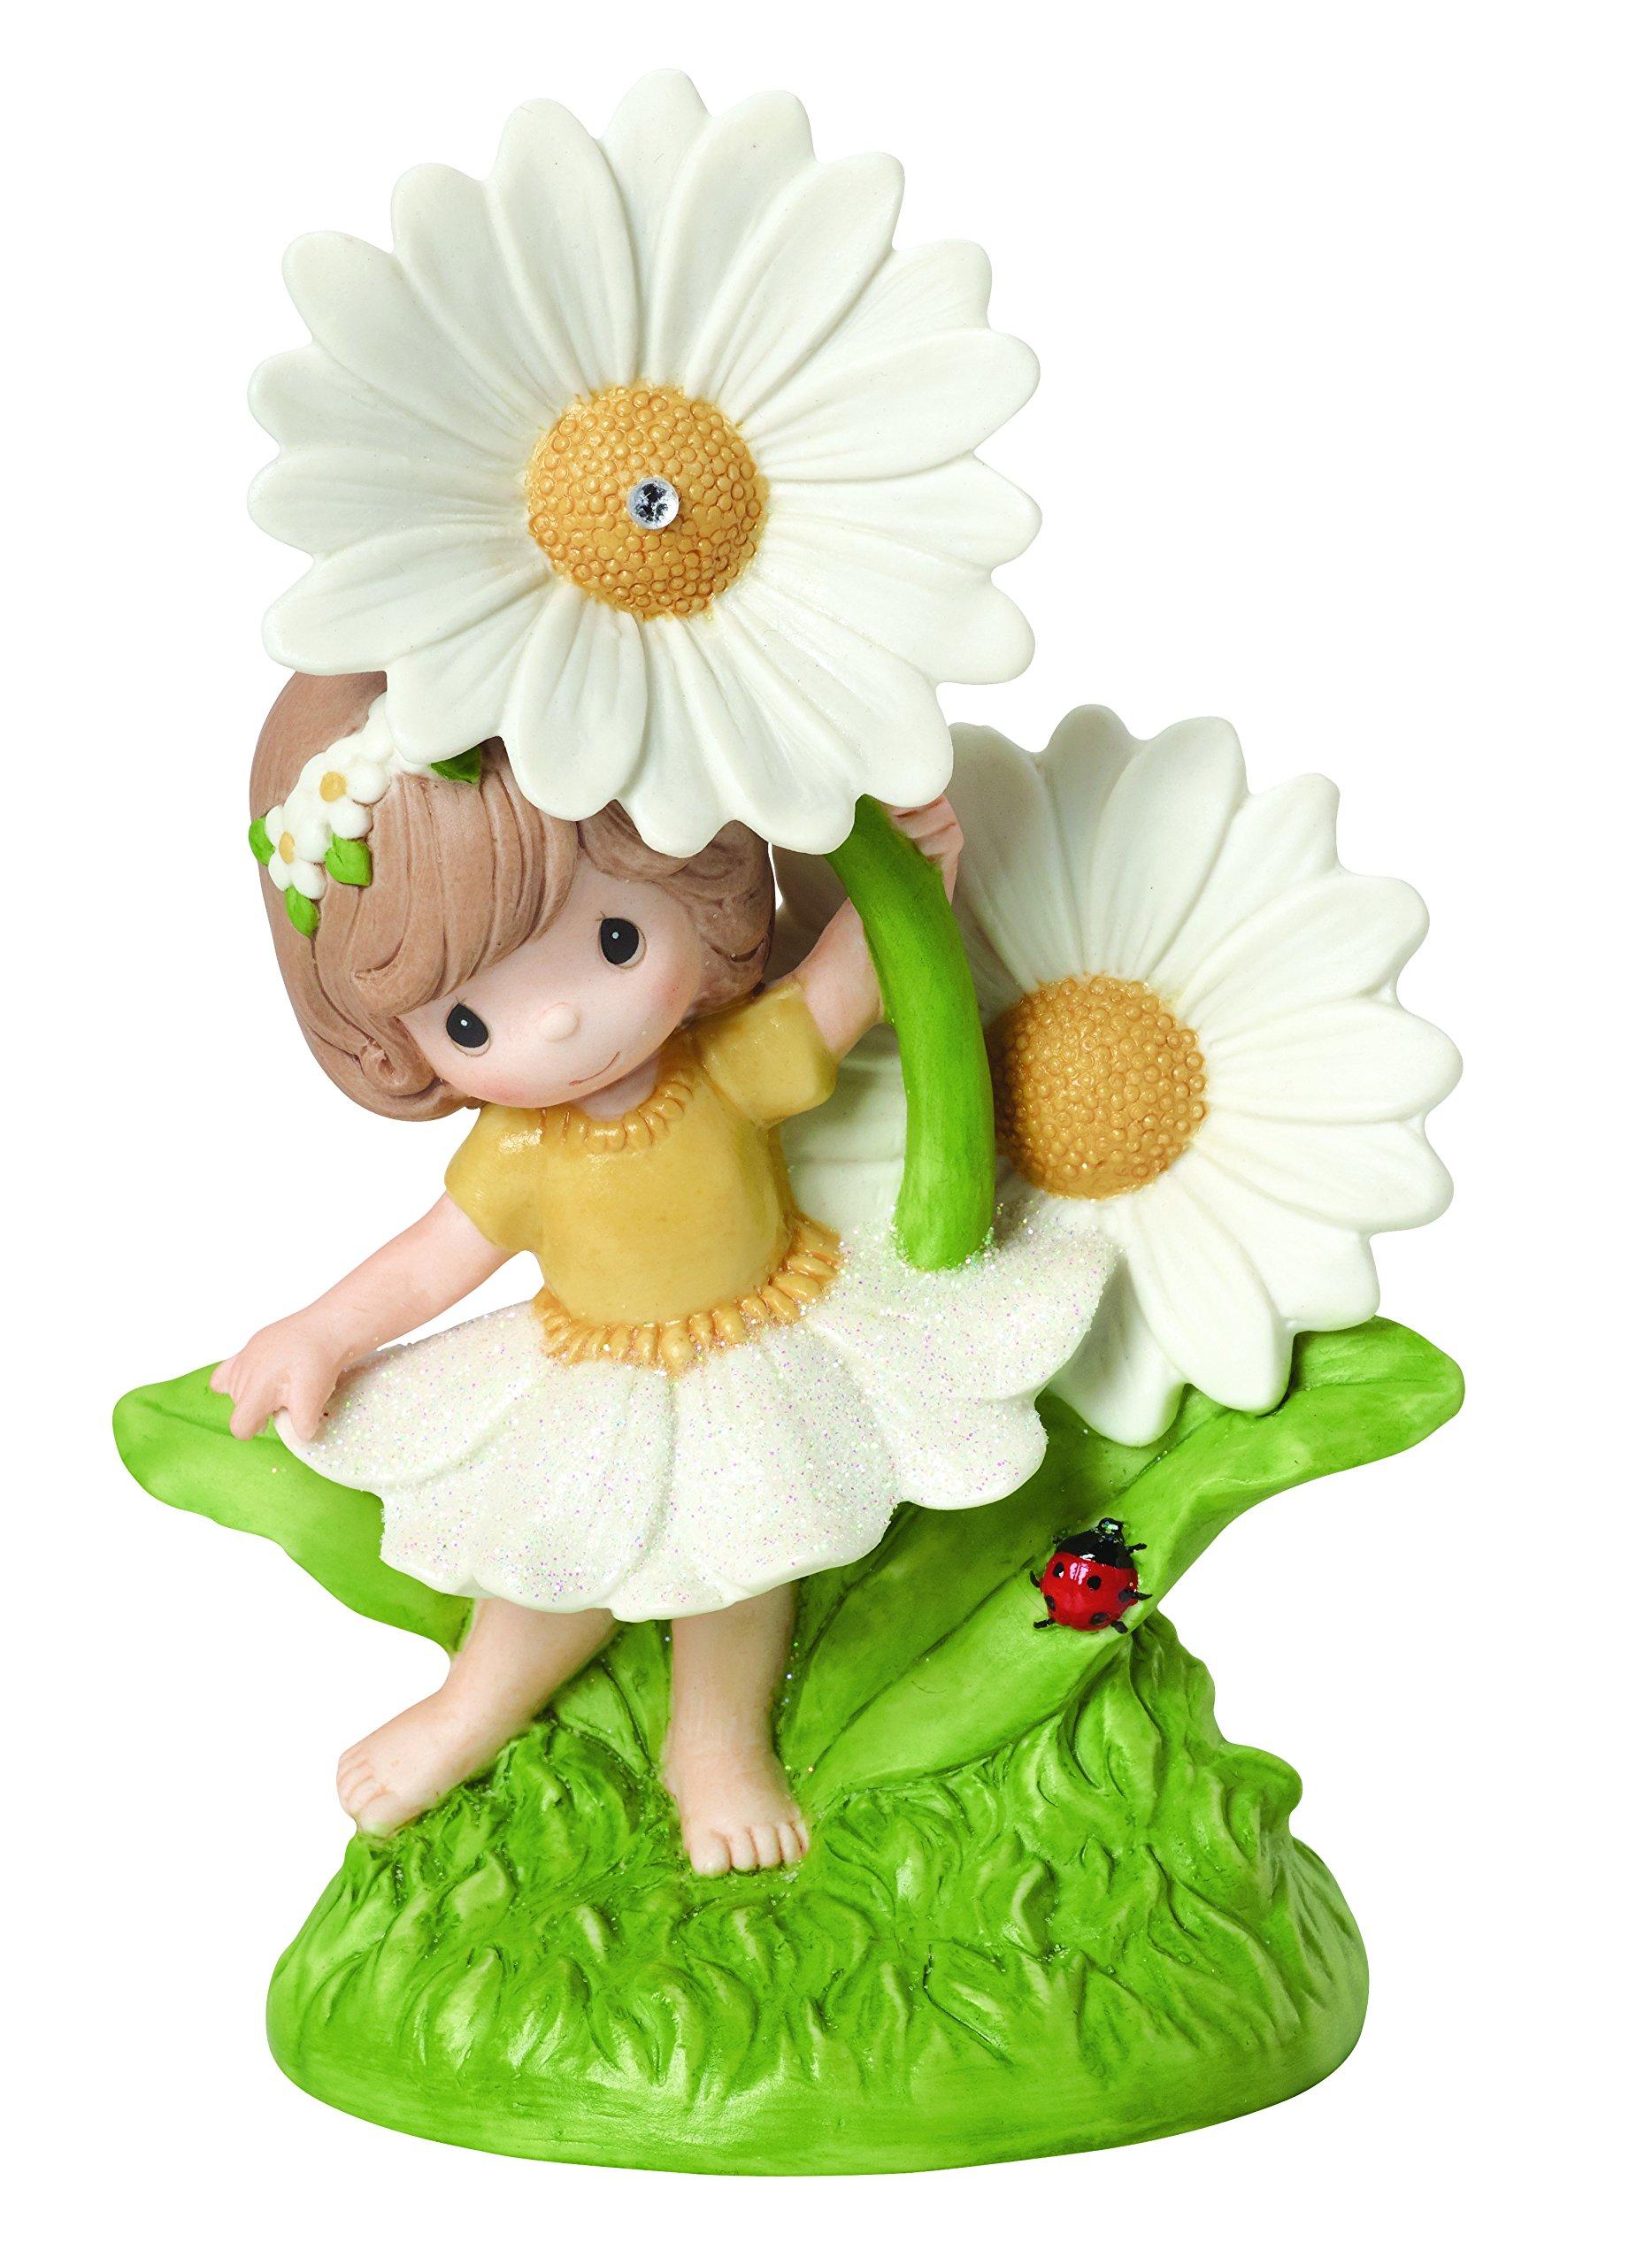 Precious Moments, You Make Everyday Brighter Bisque Porcelain Figurine, 154003 by Precious Moments